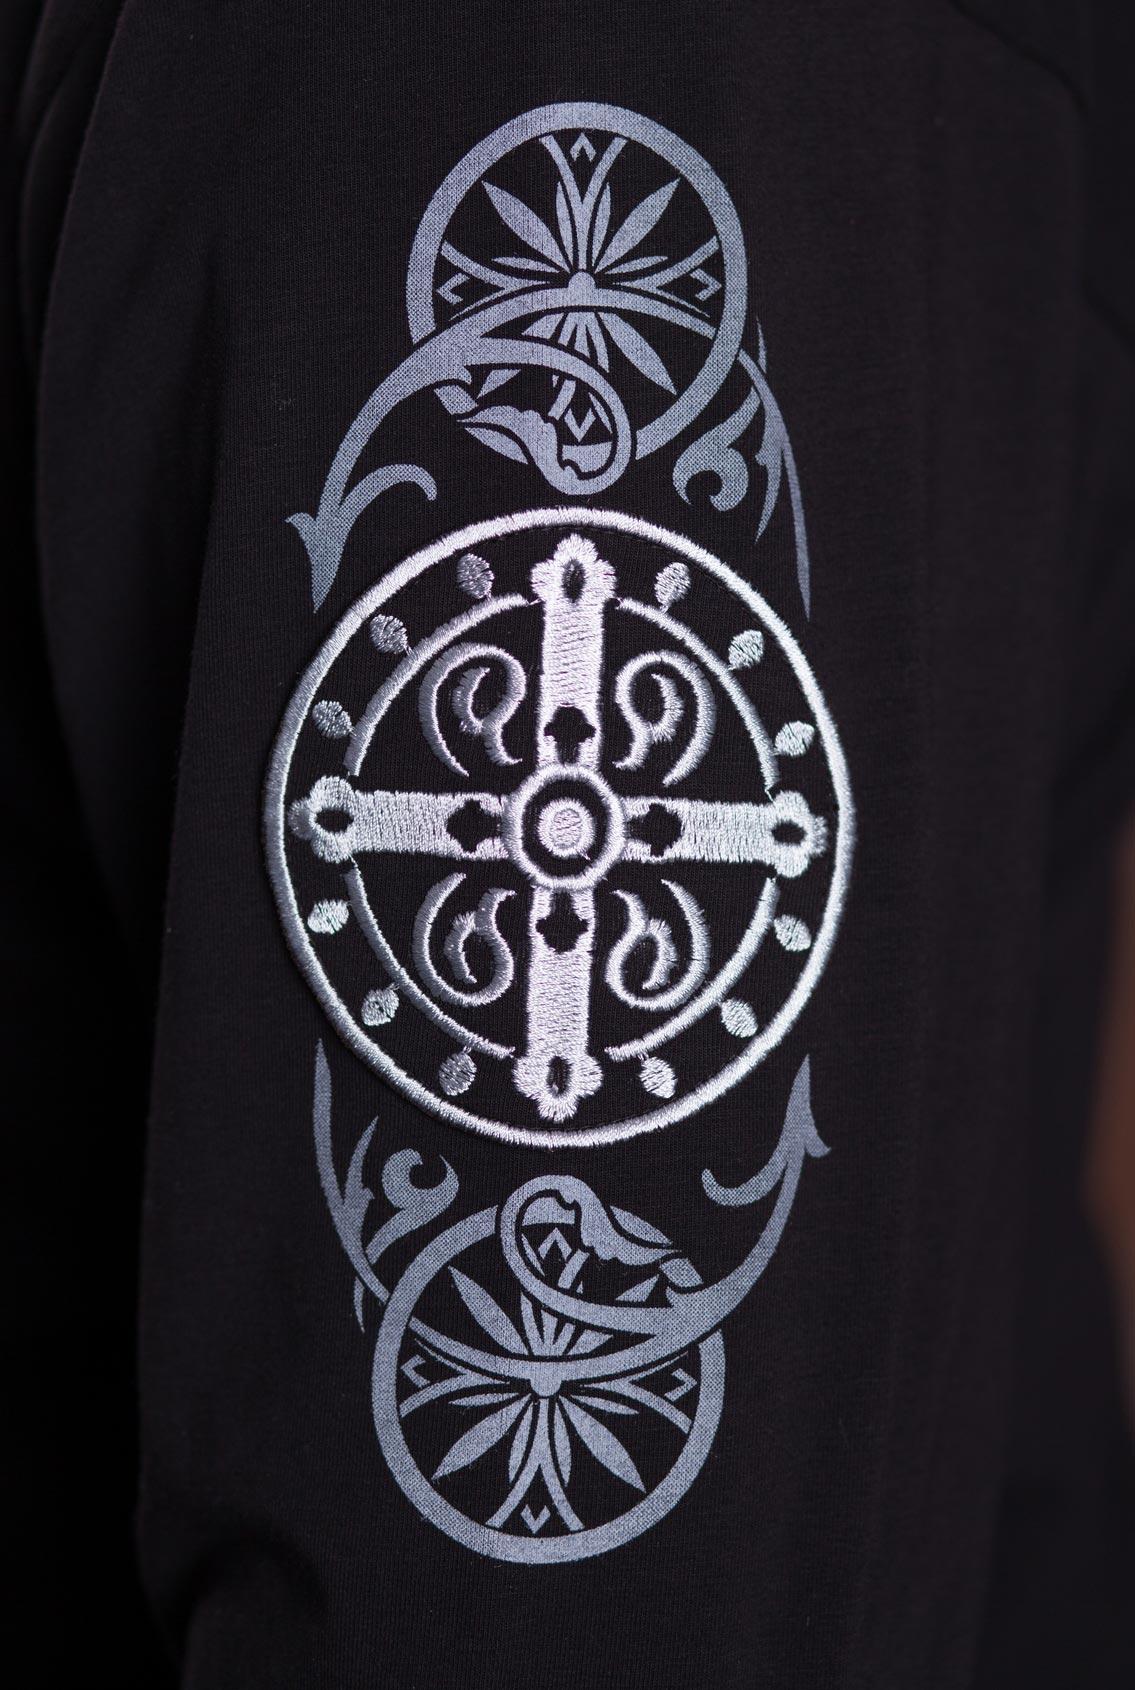 одежда с крестом, clothes with a cross